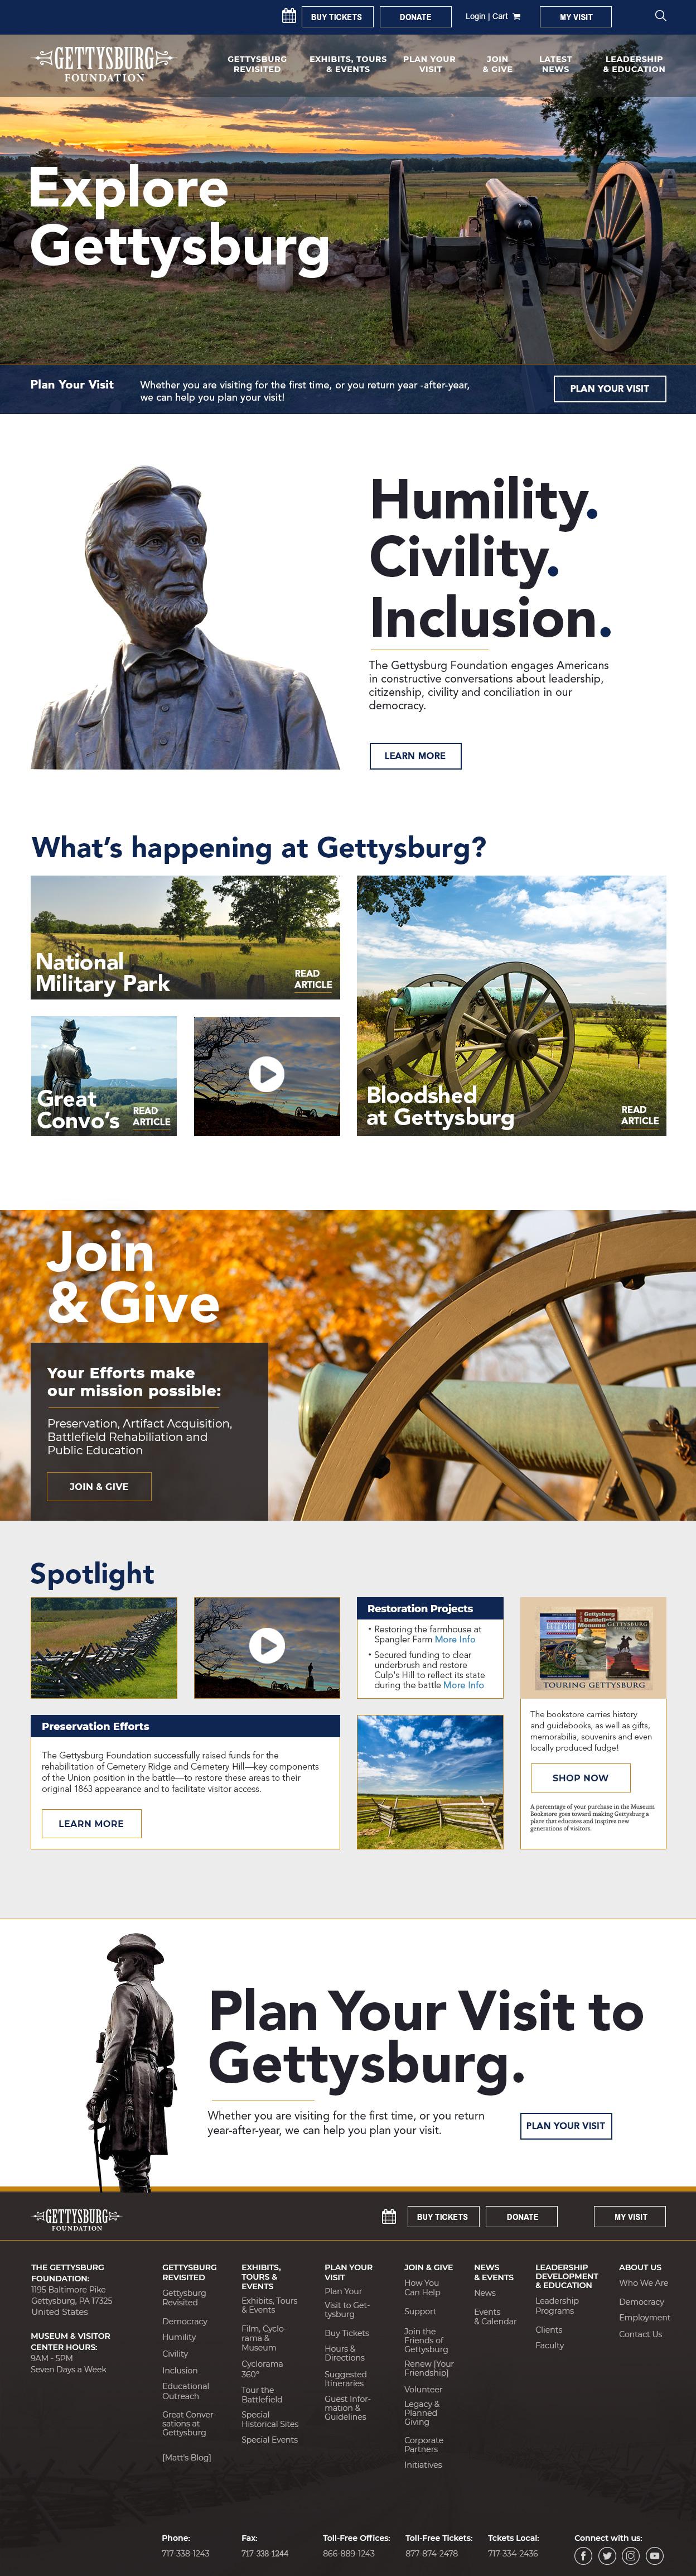 Gettysburg_Home_V4_Silo.jpg